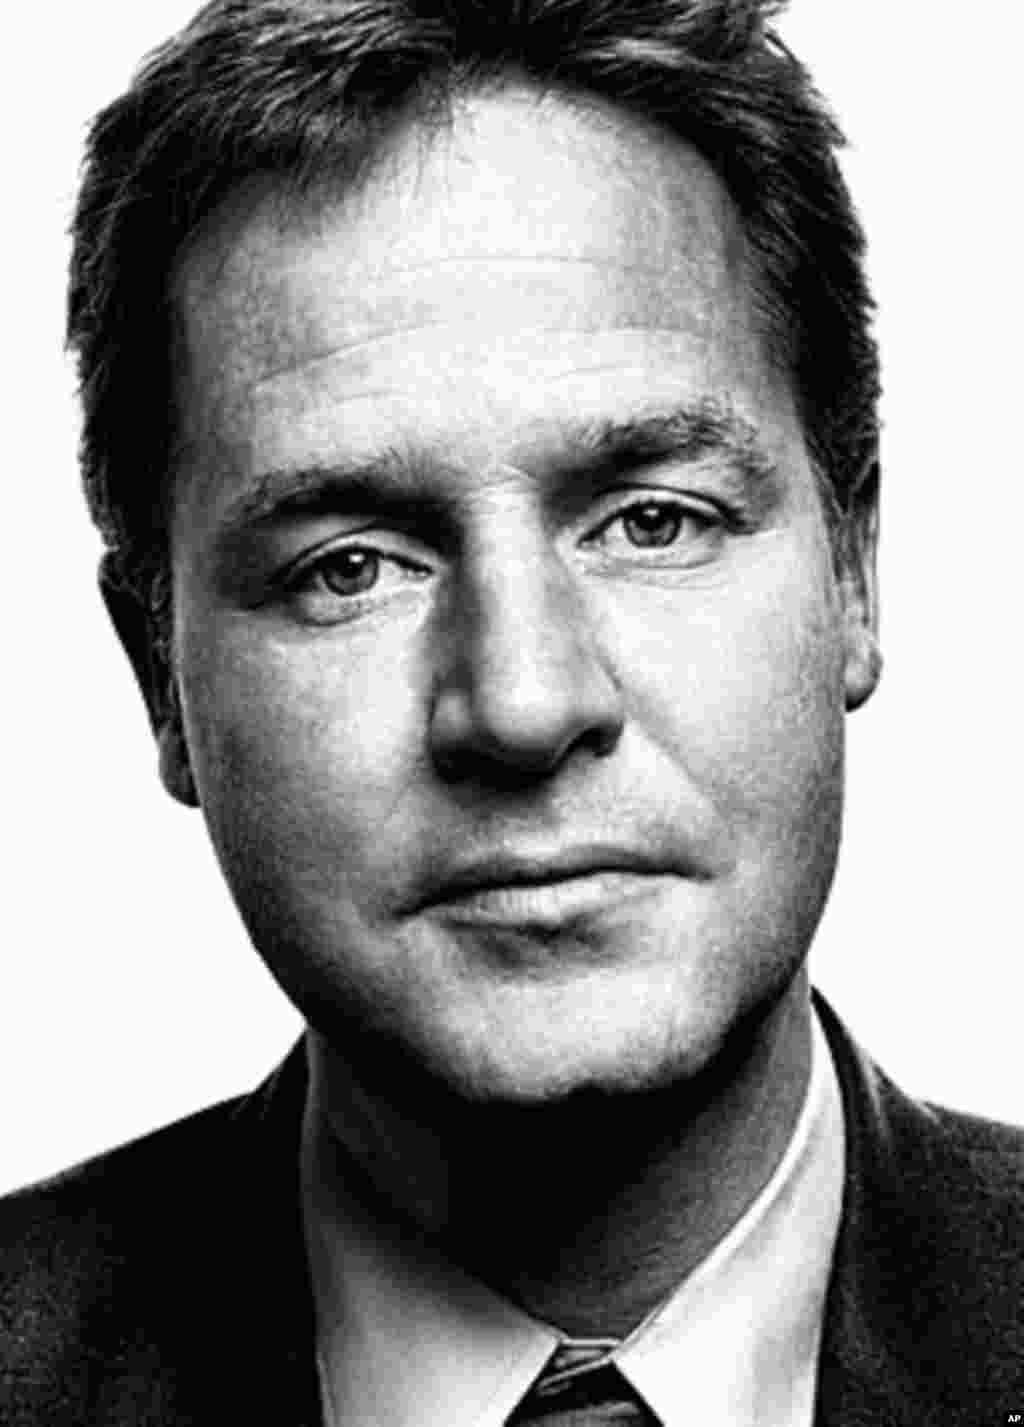 Nick Clegg, deputy prime minister of England